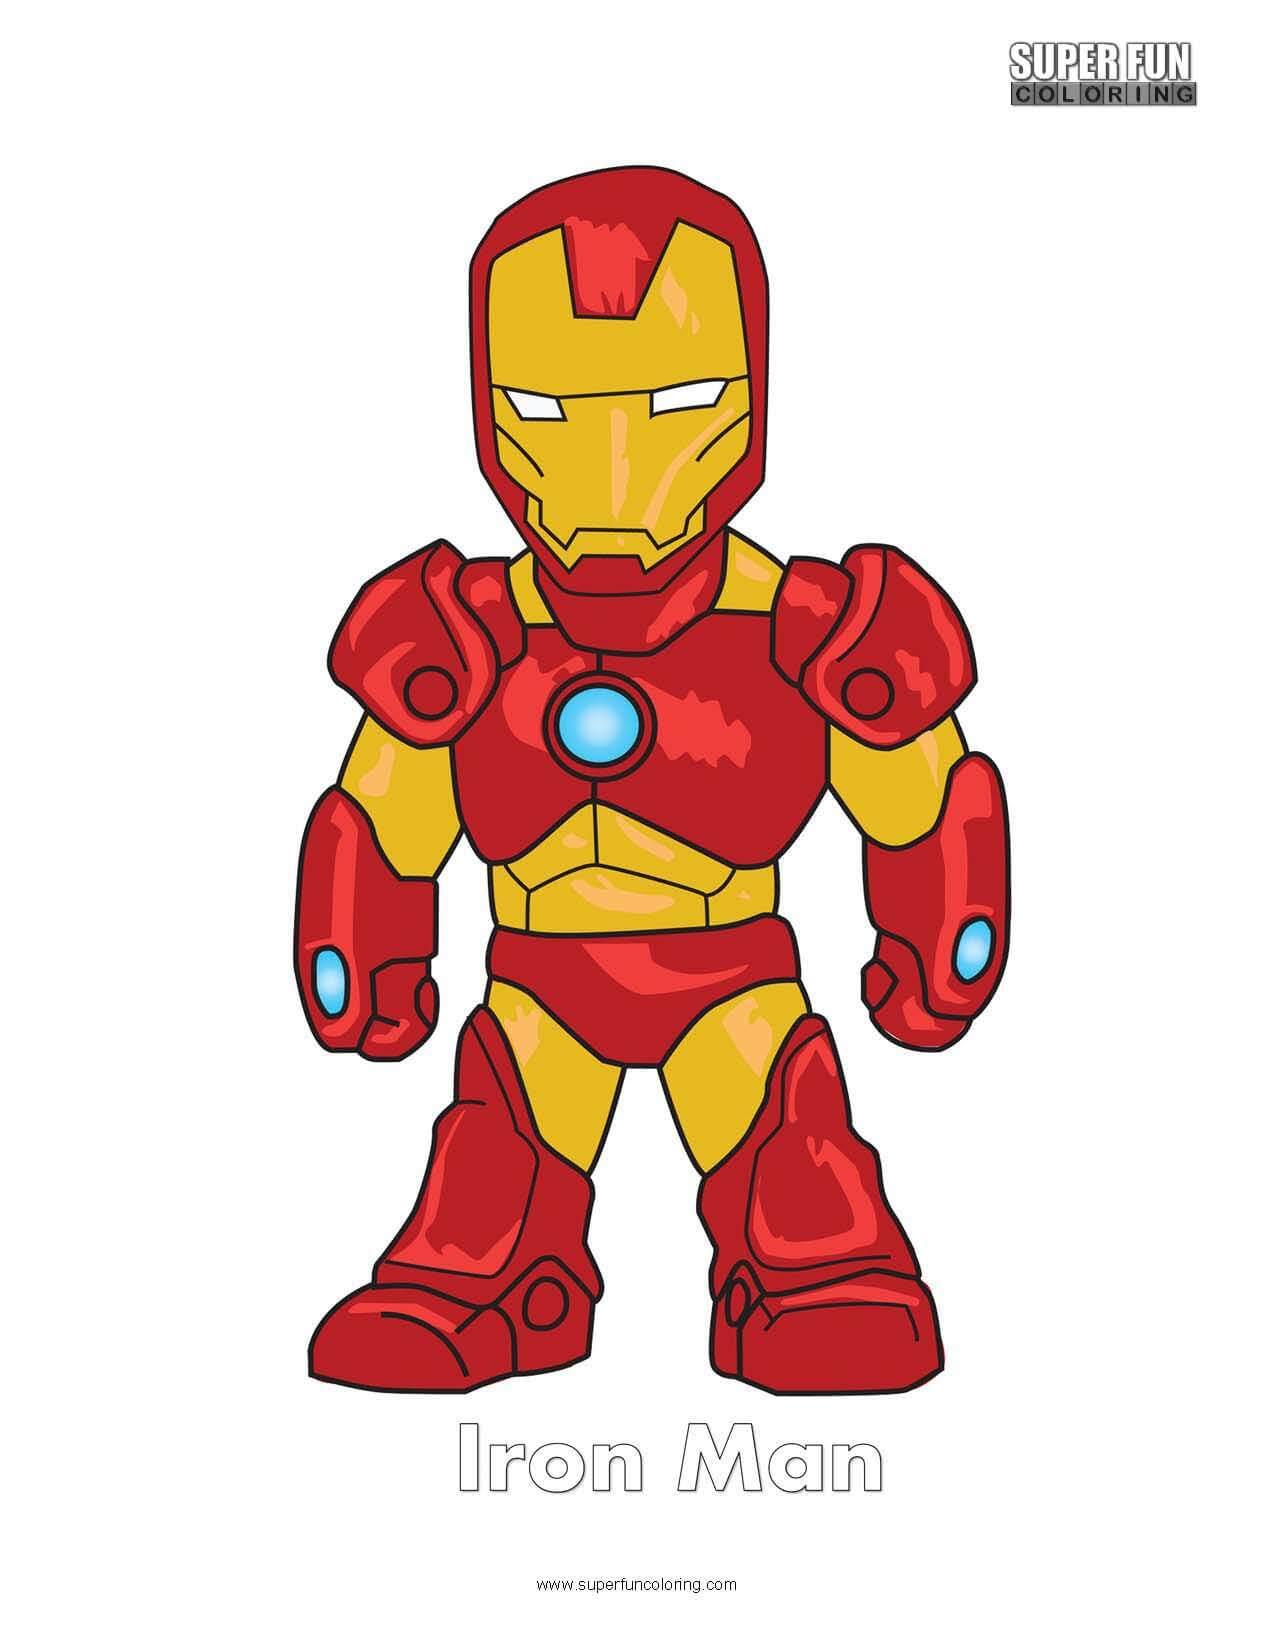 Iron Man Free Superhero Coloring Page